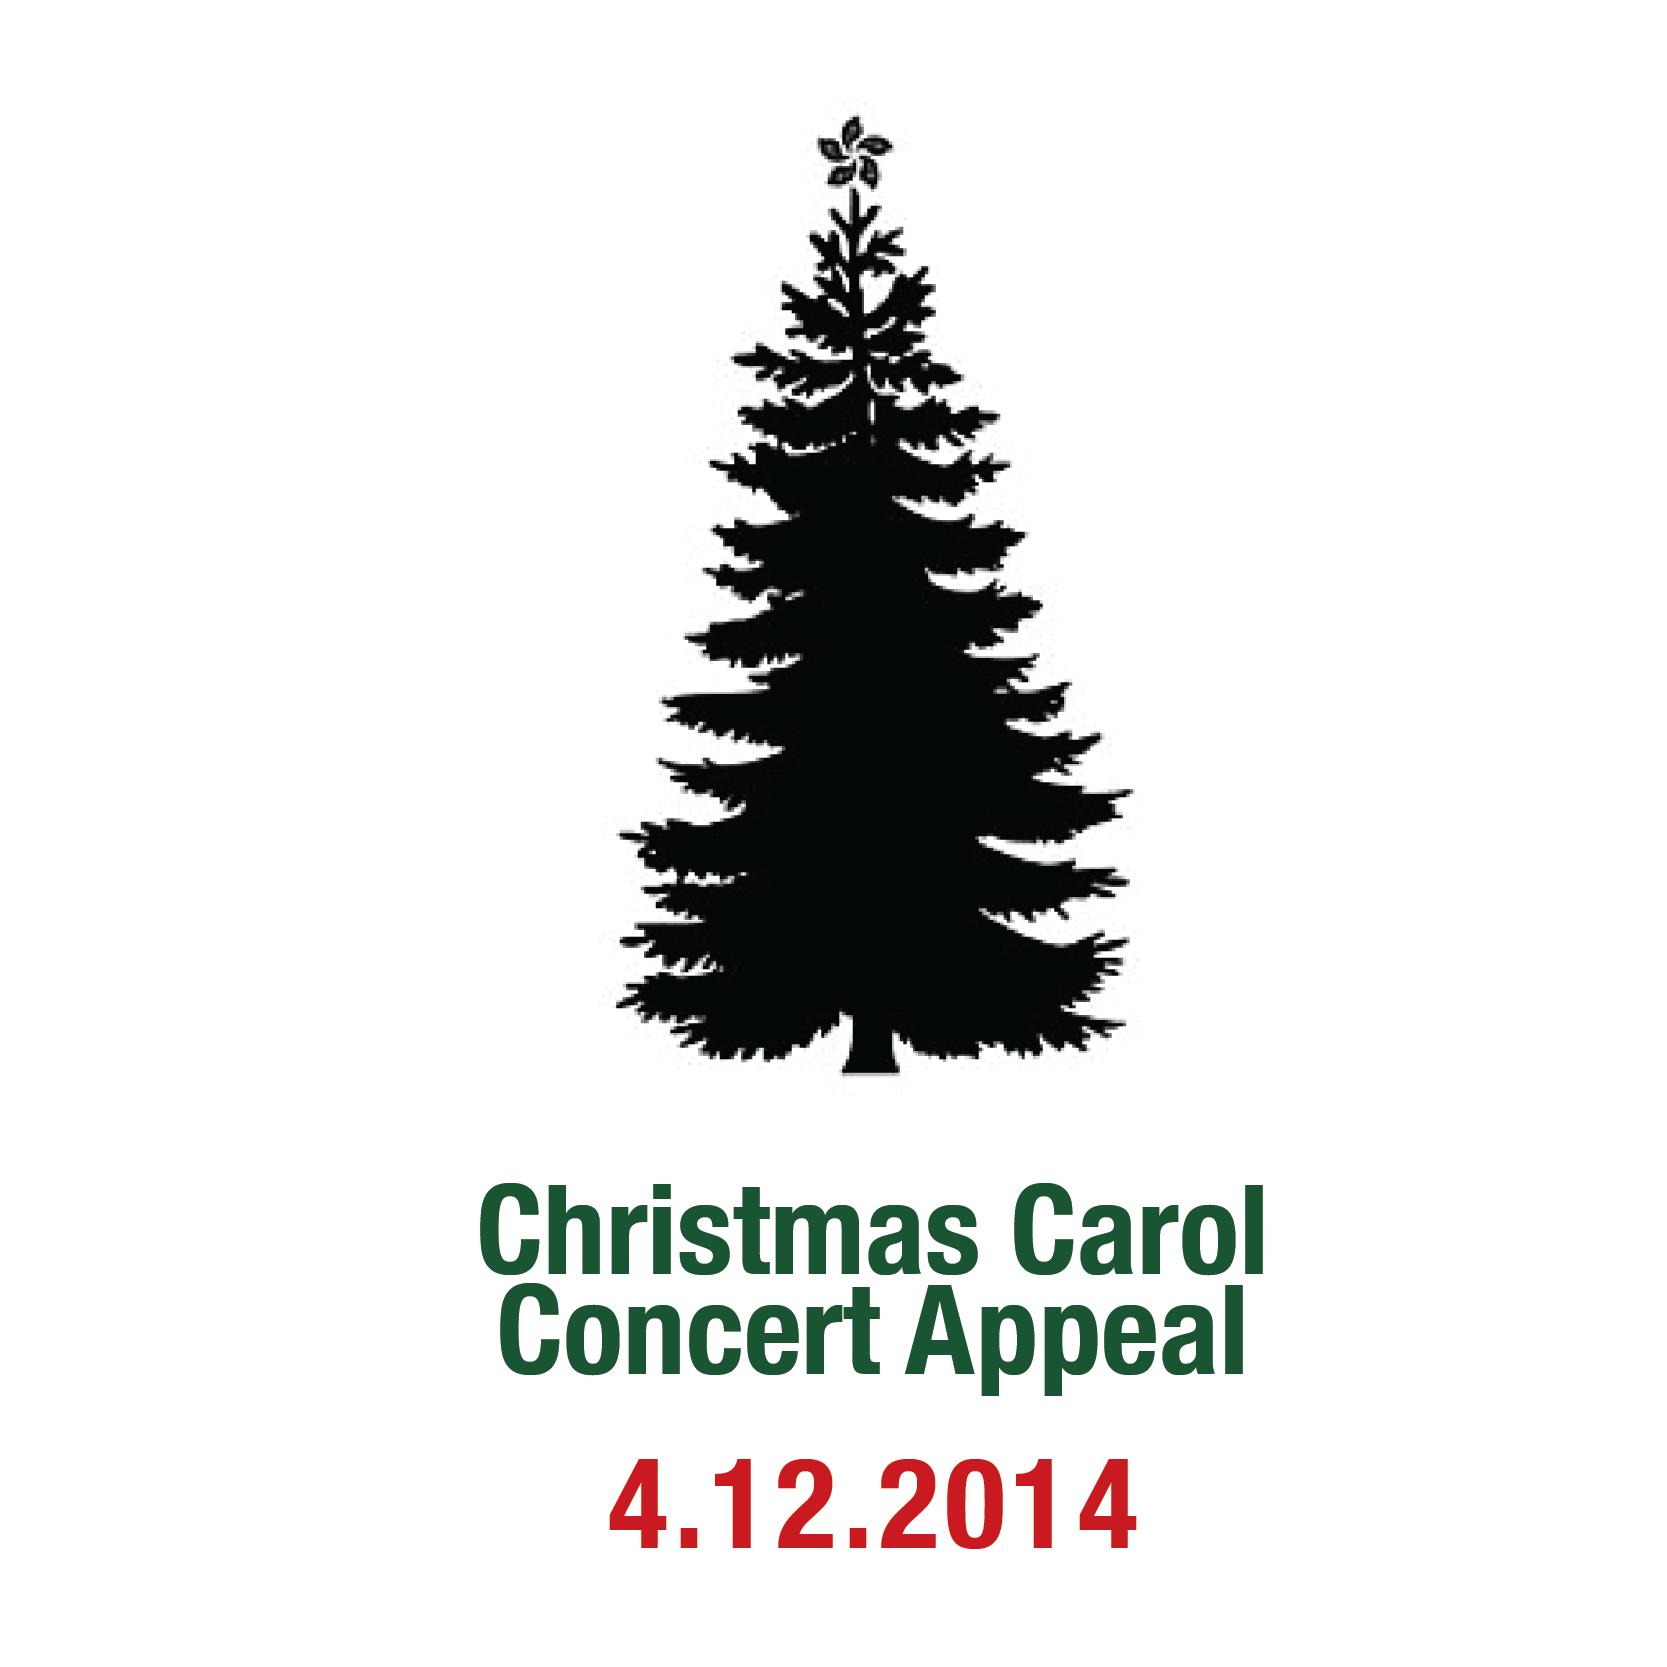 Christmas Carol Concert Appeal